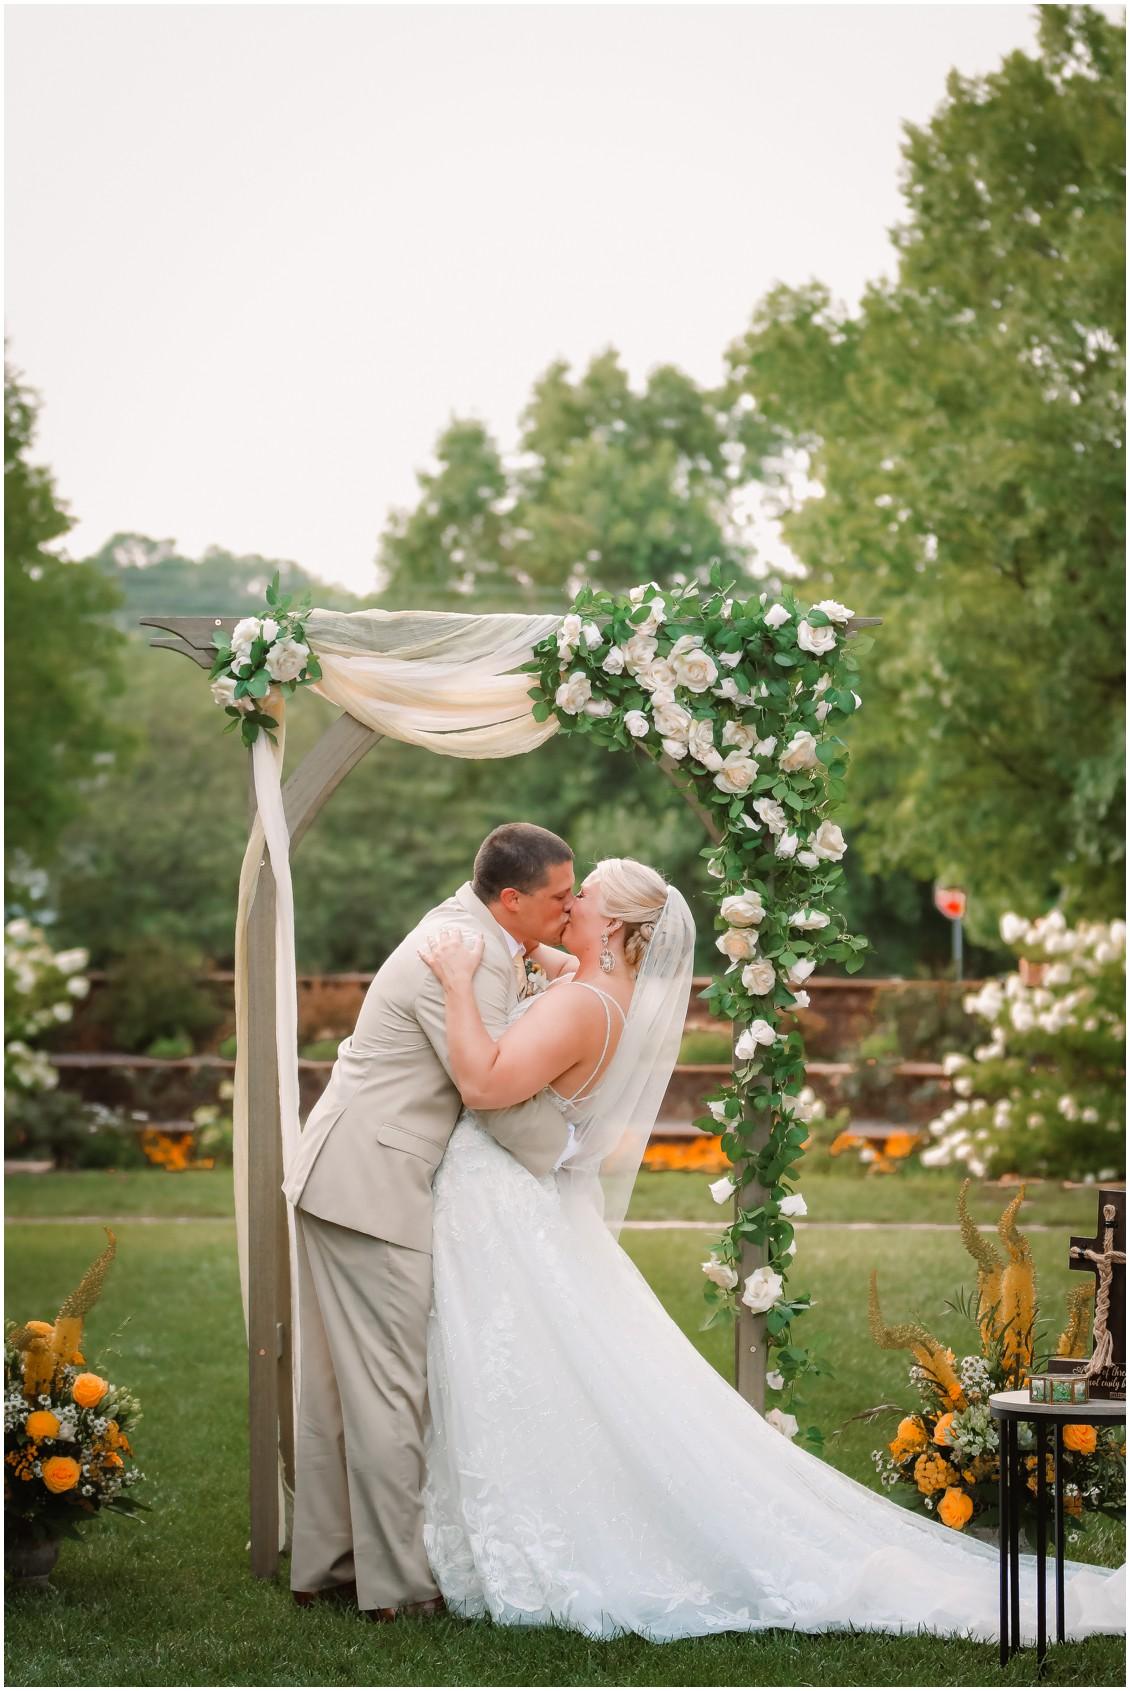 Bride and groom marriage ceremony sunny summer wedding | My Eastern Shore Wedding